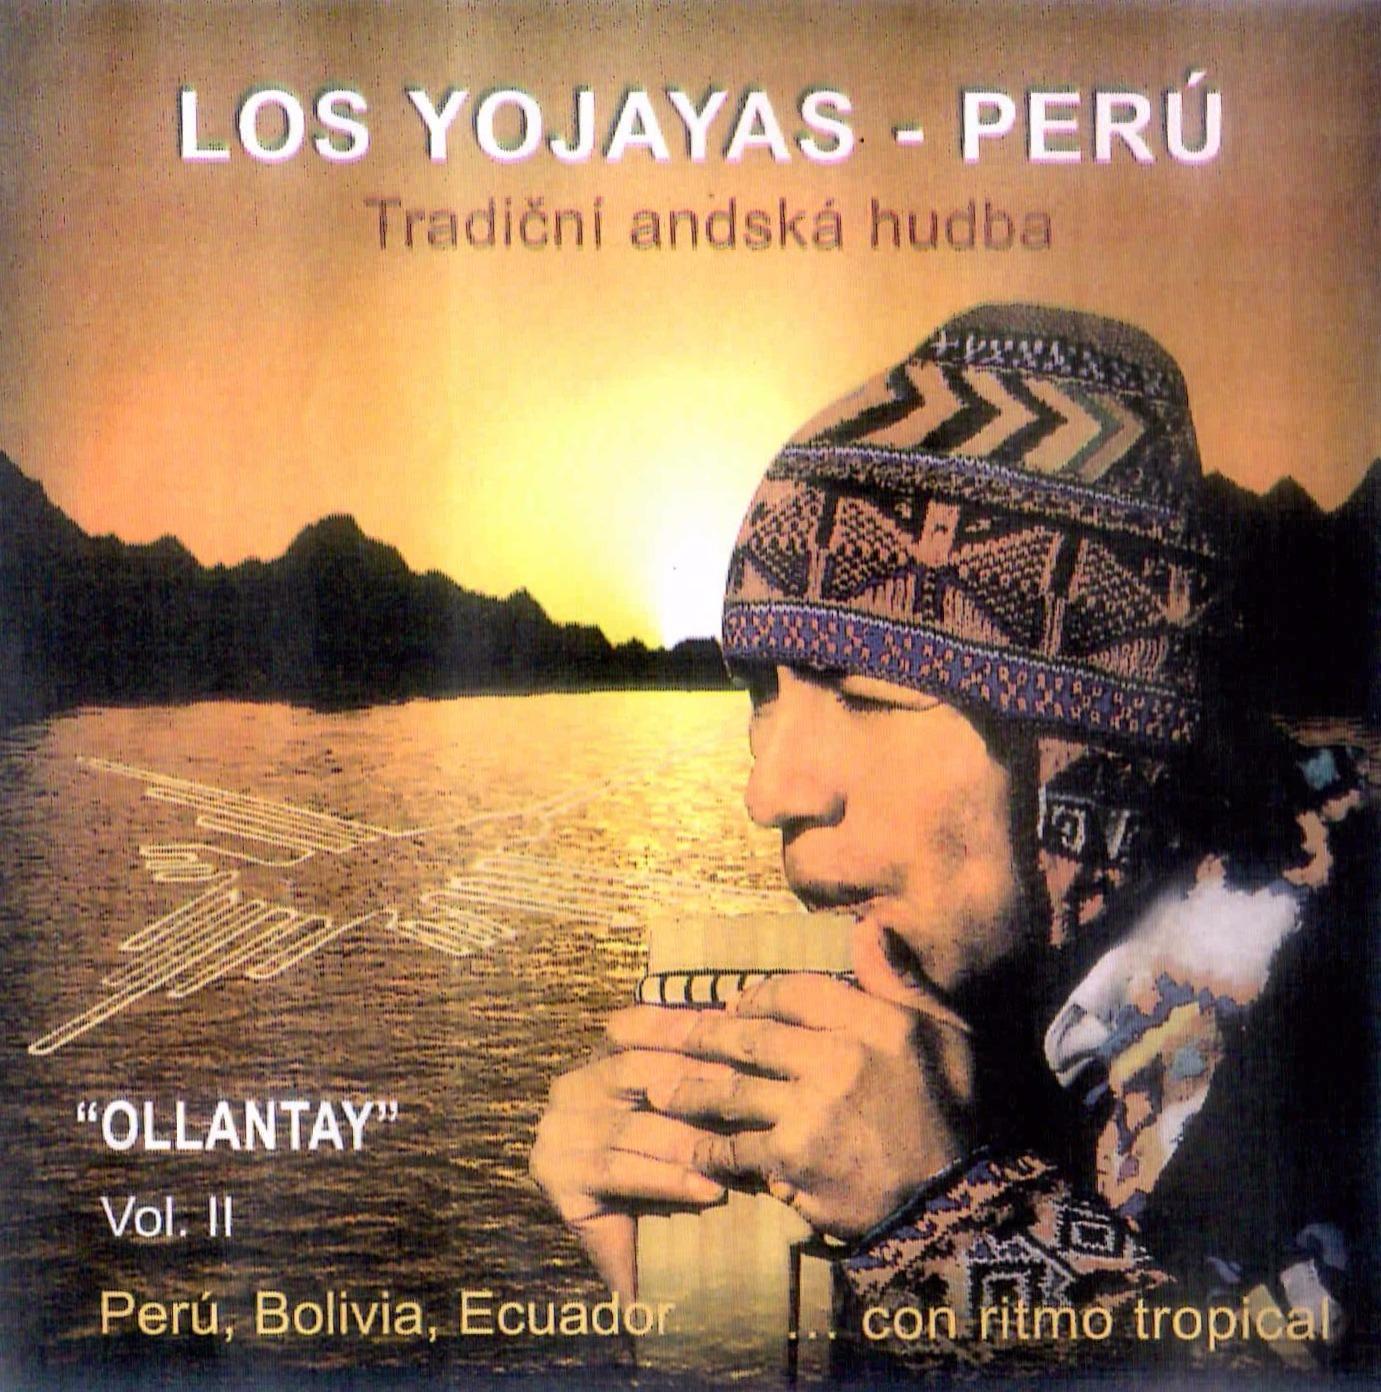 Taki Taki Rumba Songs Download: Solo Musica Andina: Los Yojayas